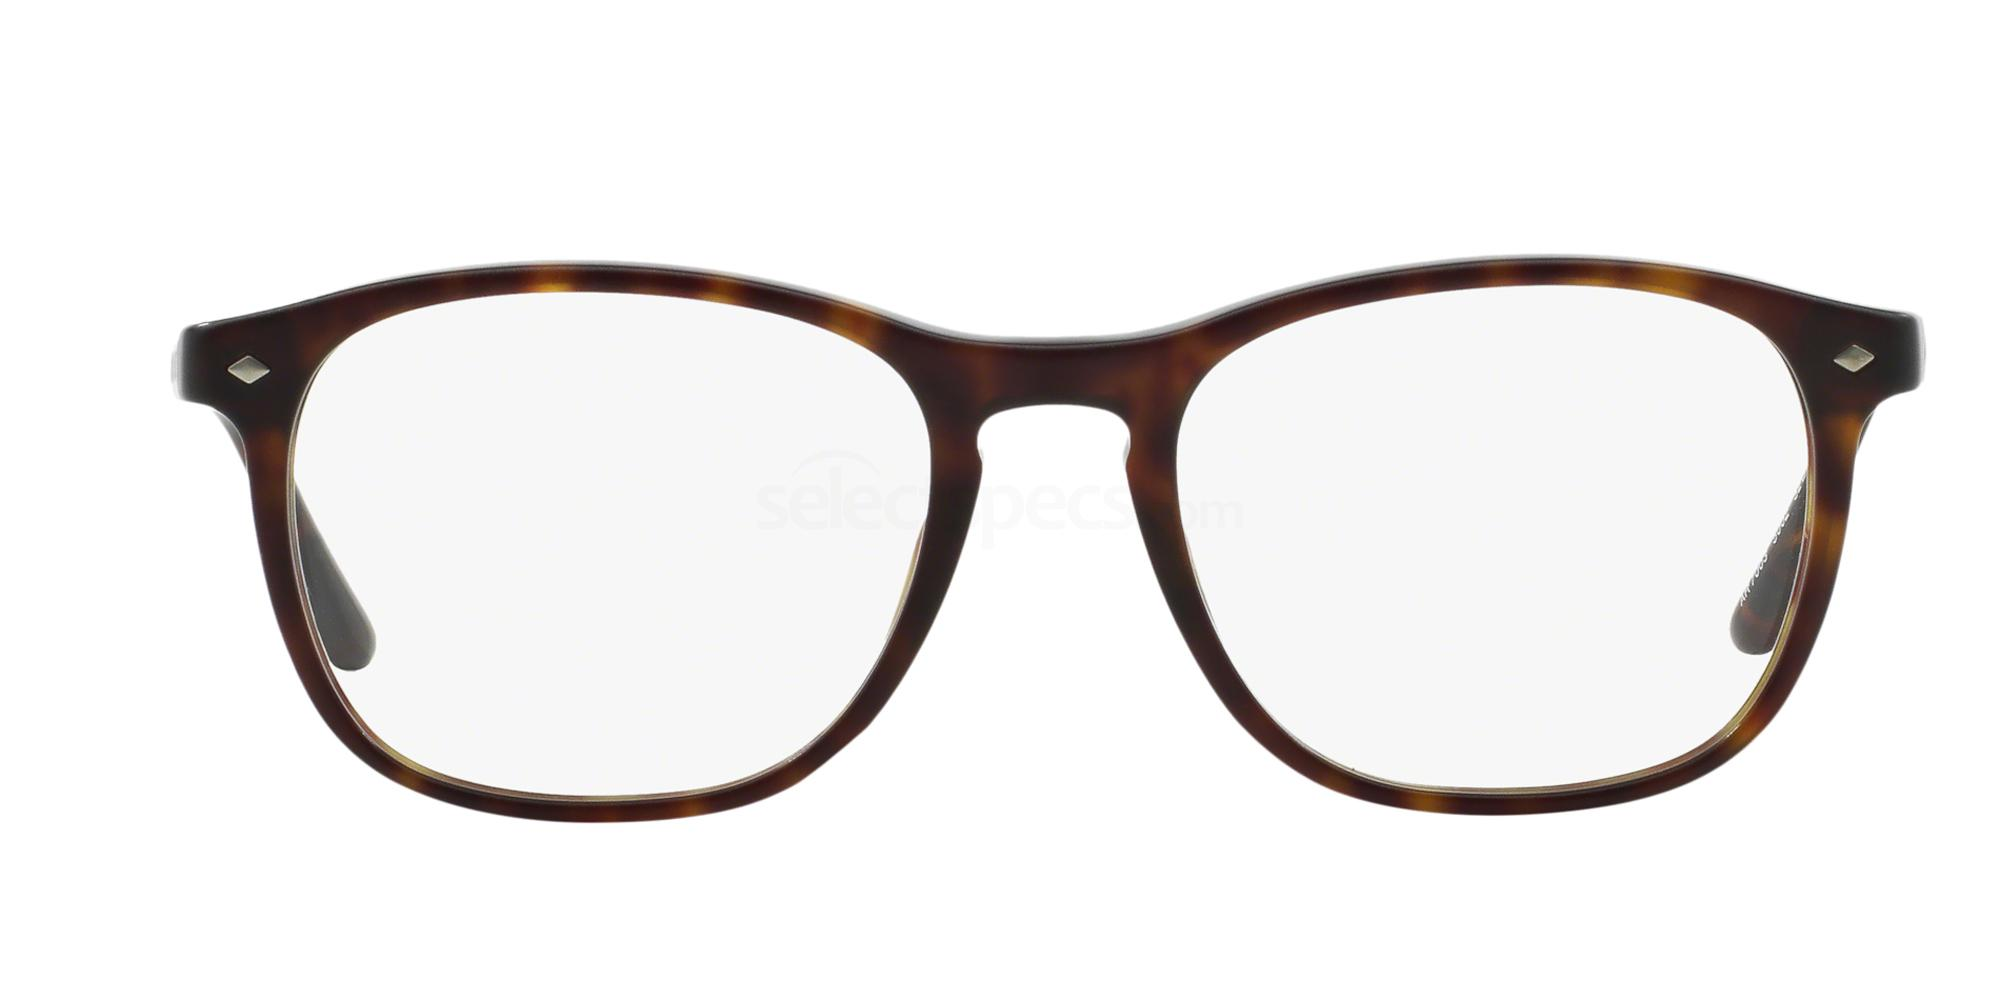 5002 AR7003 Glasses, Giorgio Armani